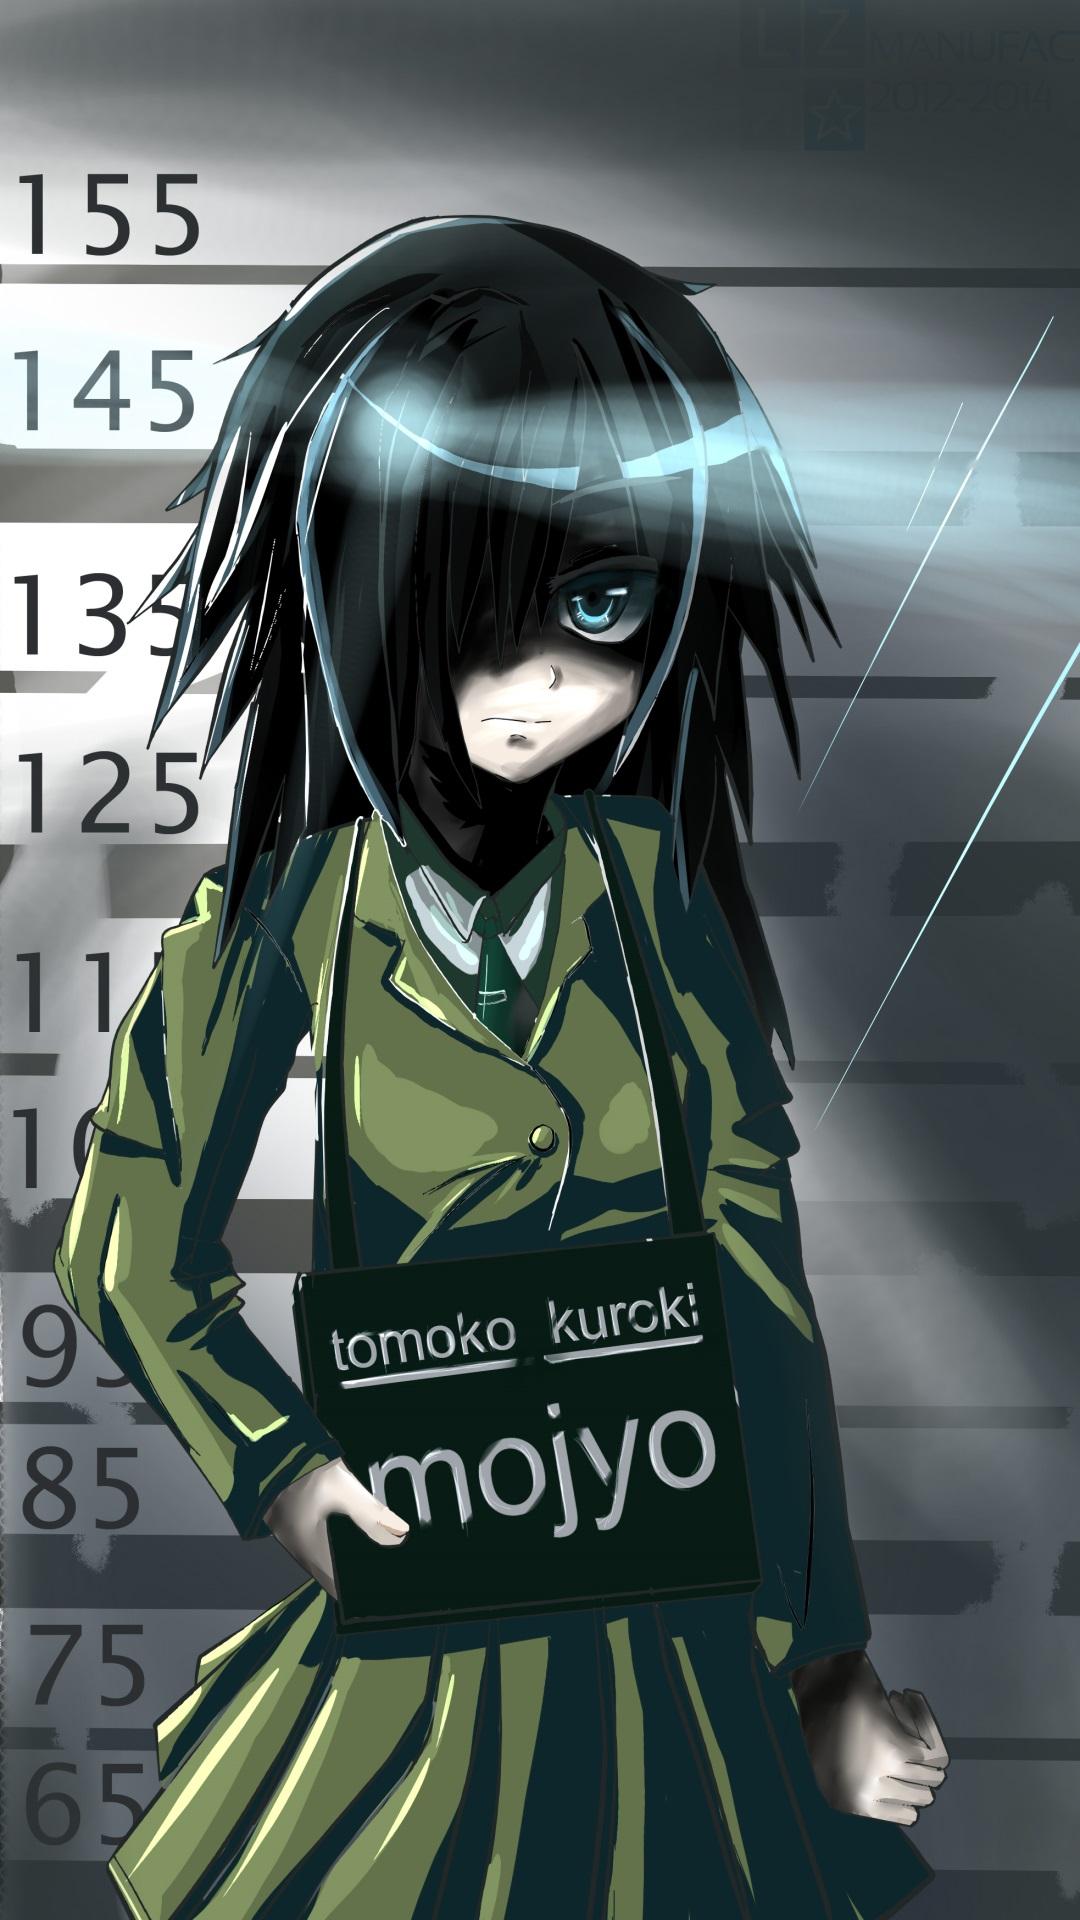 Watamote tomoko kuroki samsung galaxy note 3 wallpaper - Anime wallpaper hd for android phones ...